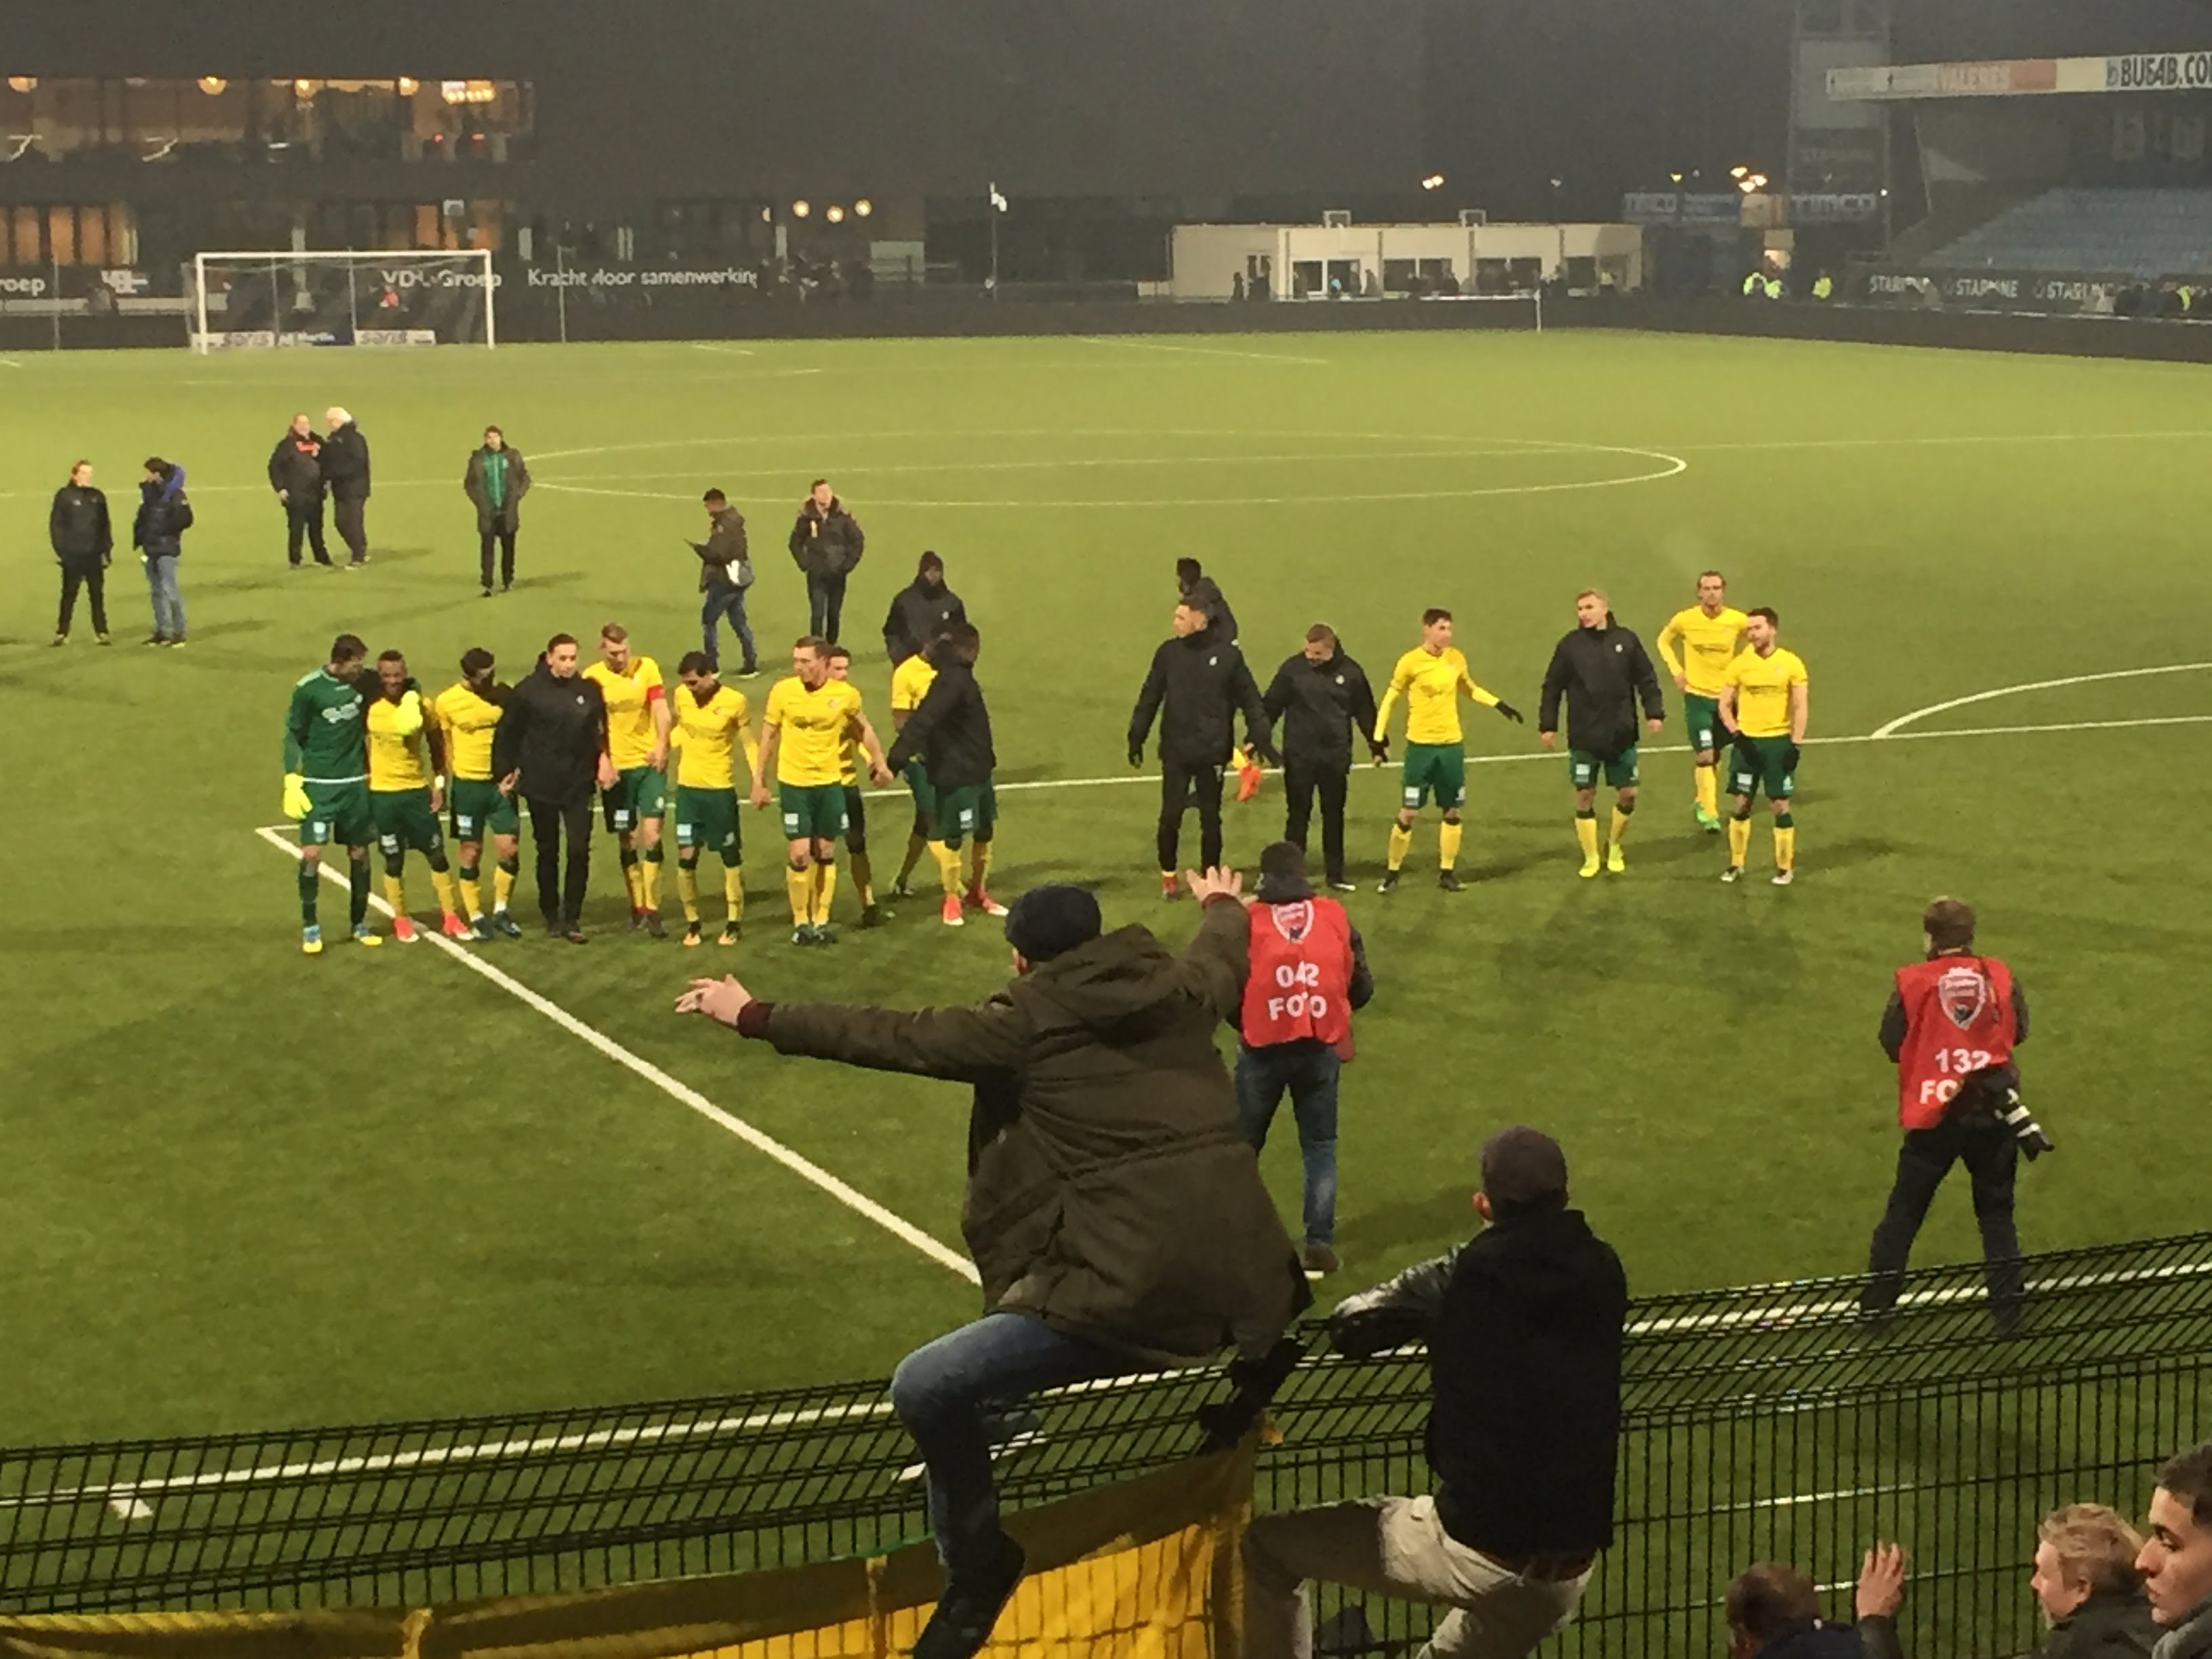 Jong PSV 2 Fortuna Sittard 3